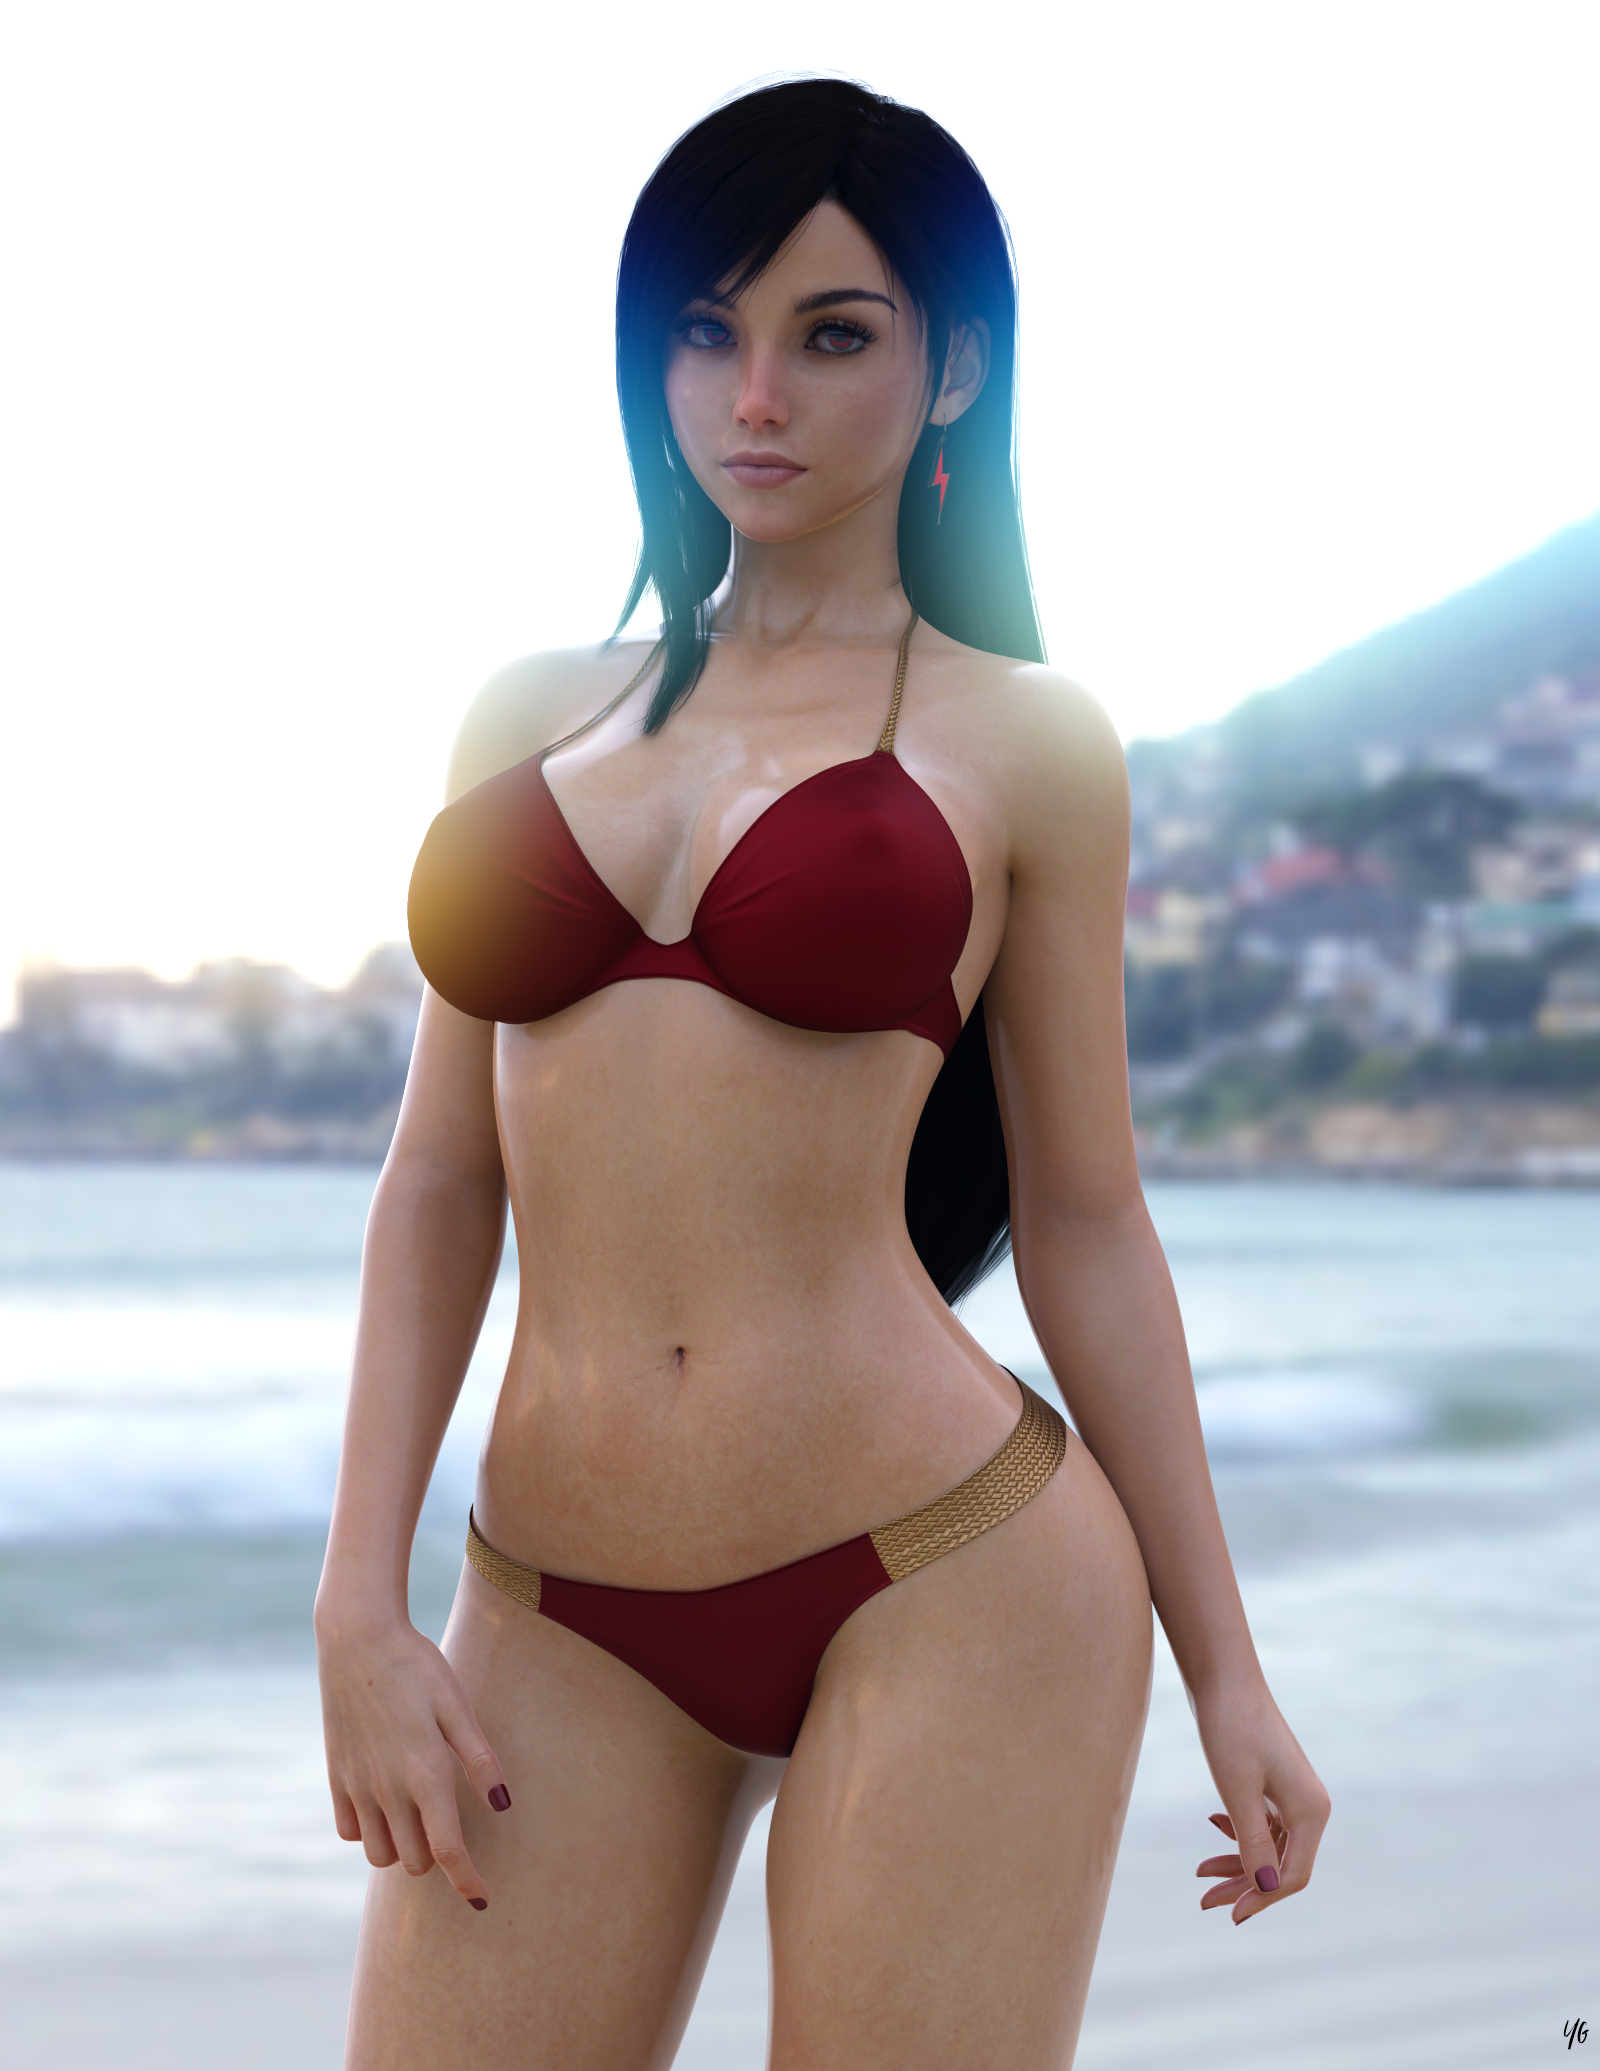 Tifa on beach